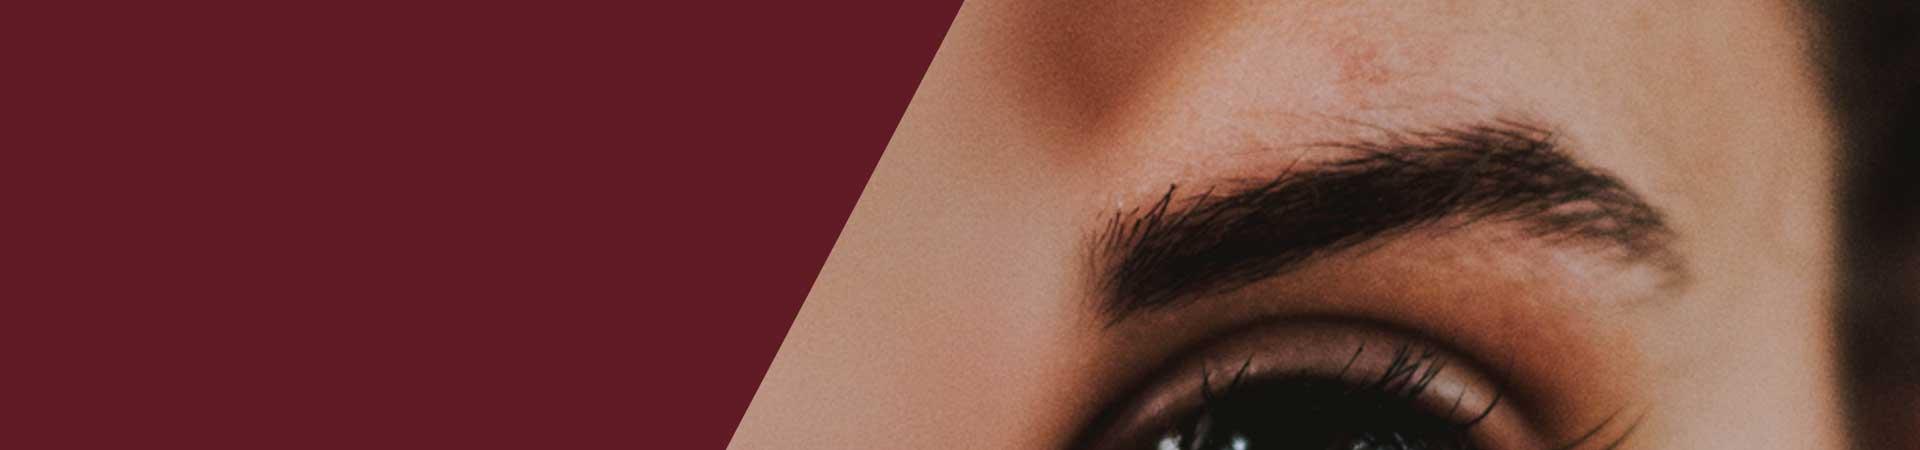 Augenbrauenimplantation